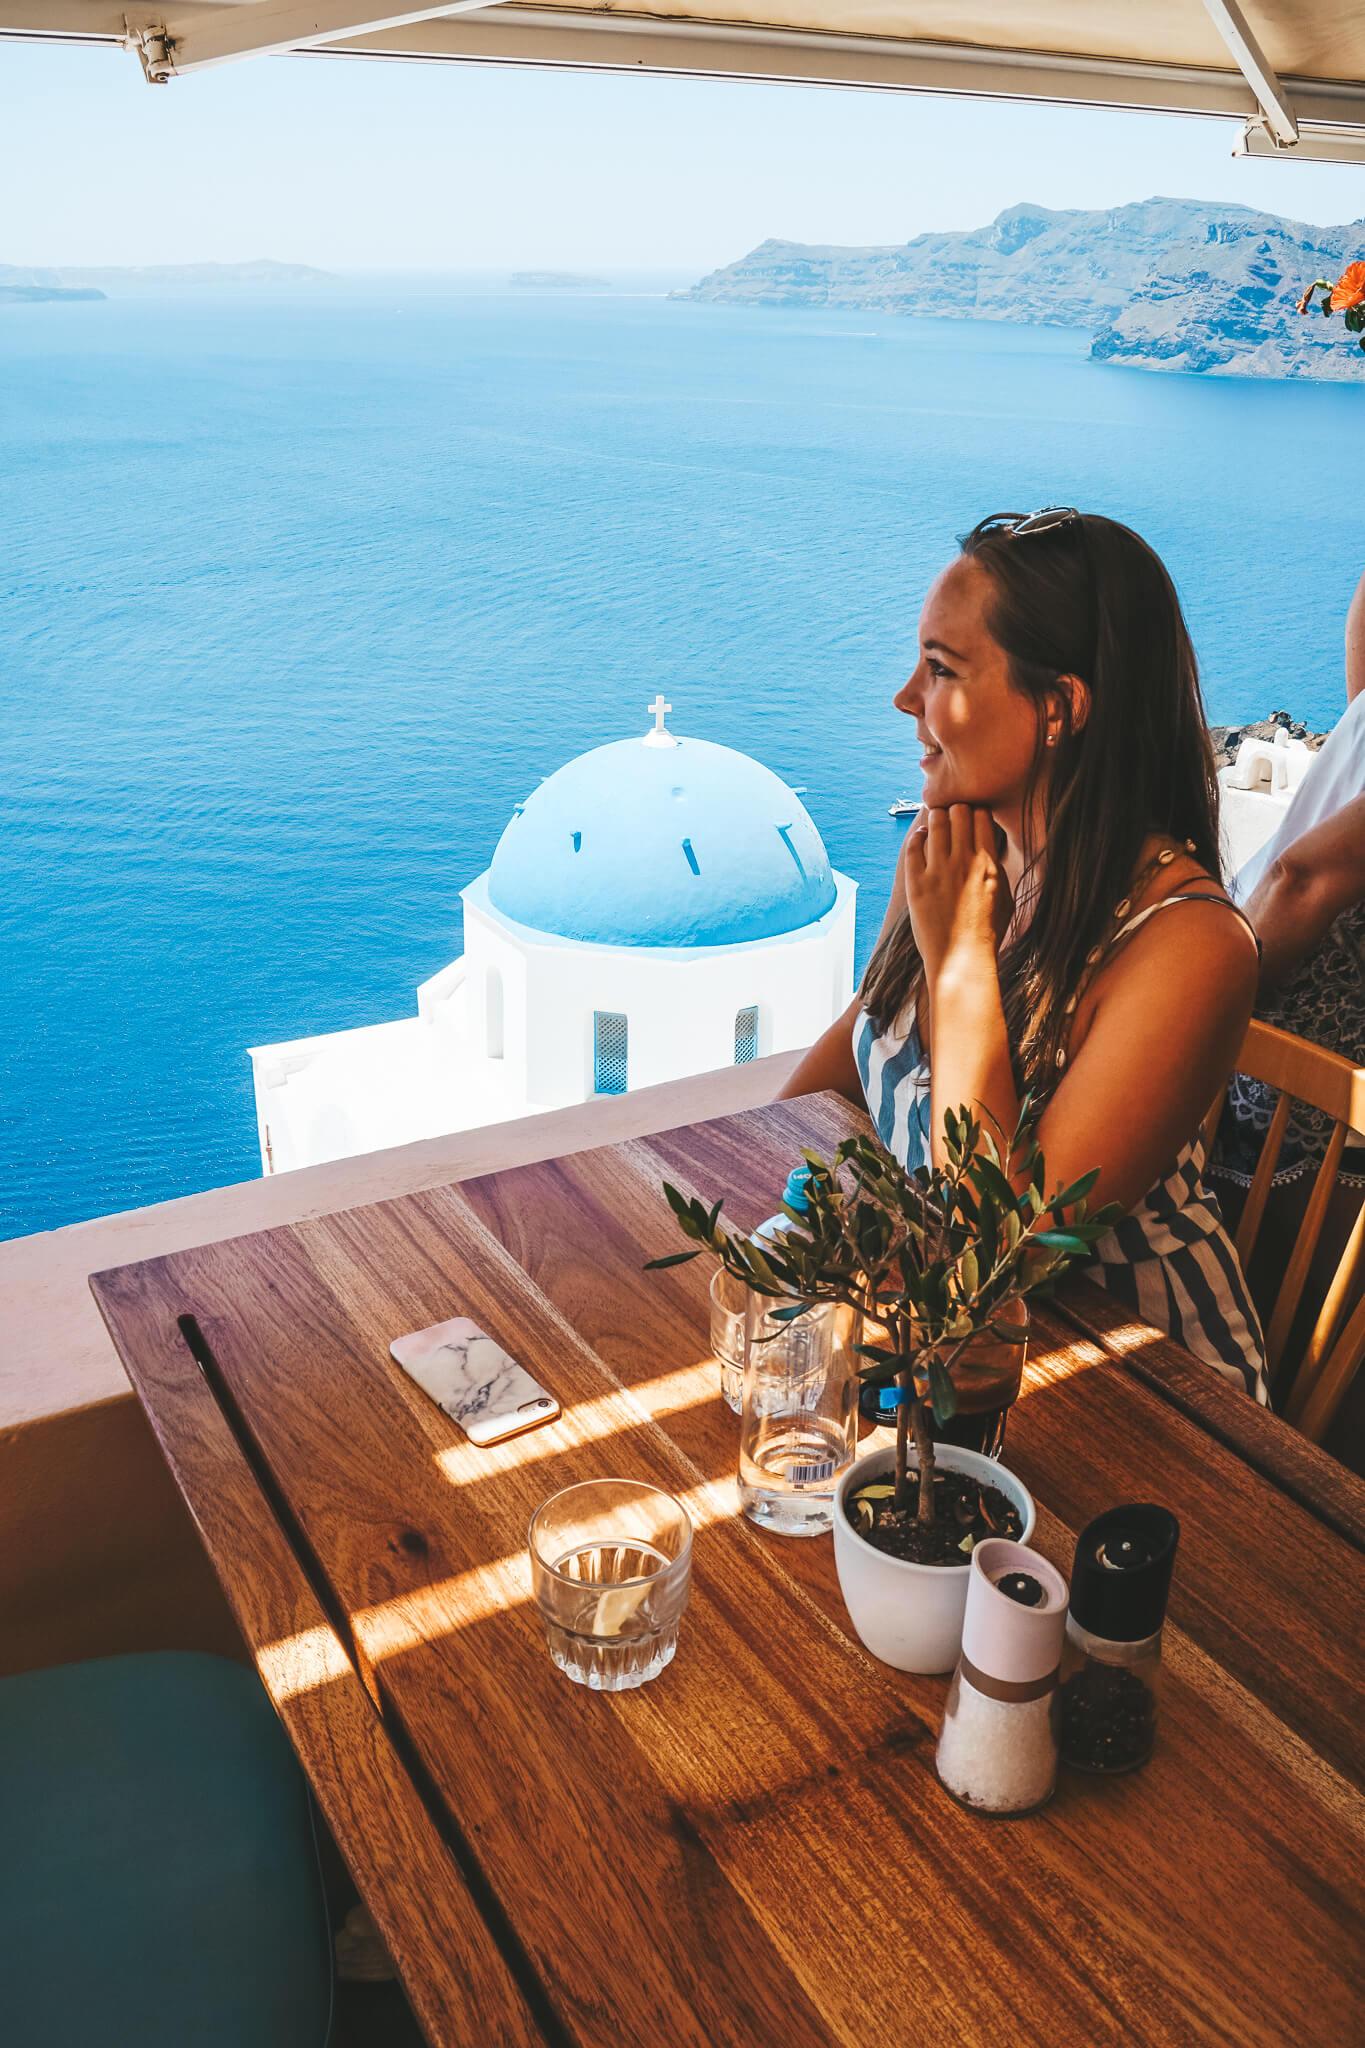 Restaurant-Santorin-Oia-TerpsnOia-Reiseblog-VonPalmenundBergen